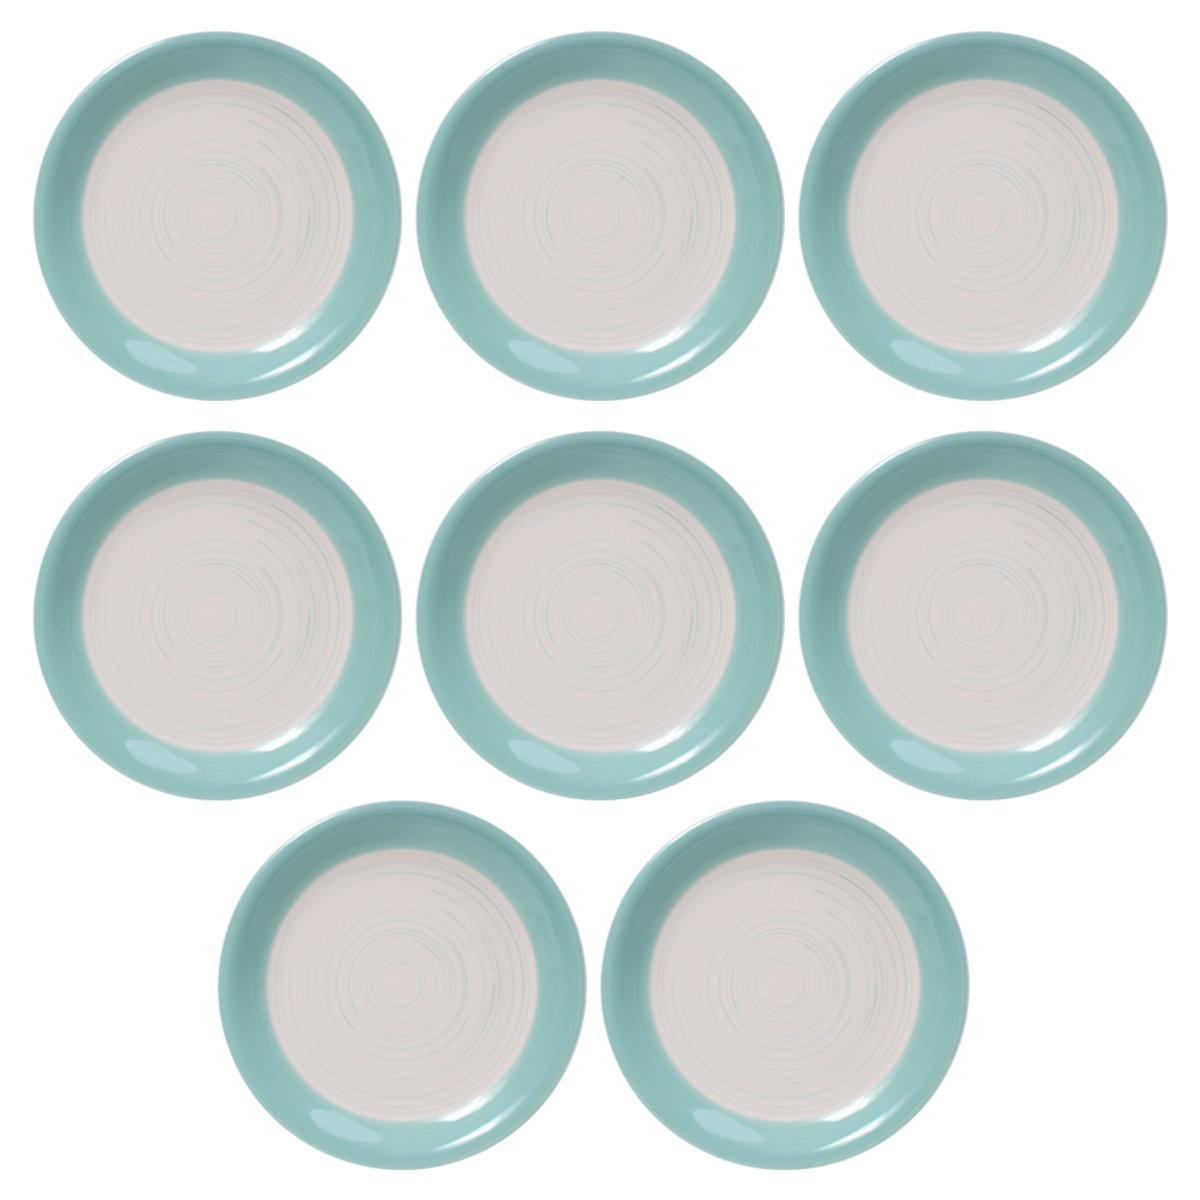 Set Platos Ensaladero Mesa Ceramica 8 Pz Crown Baccara